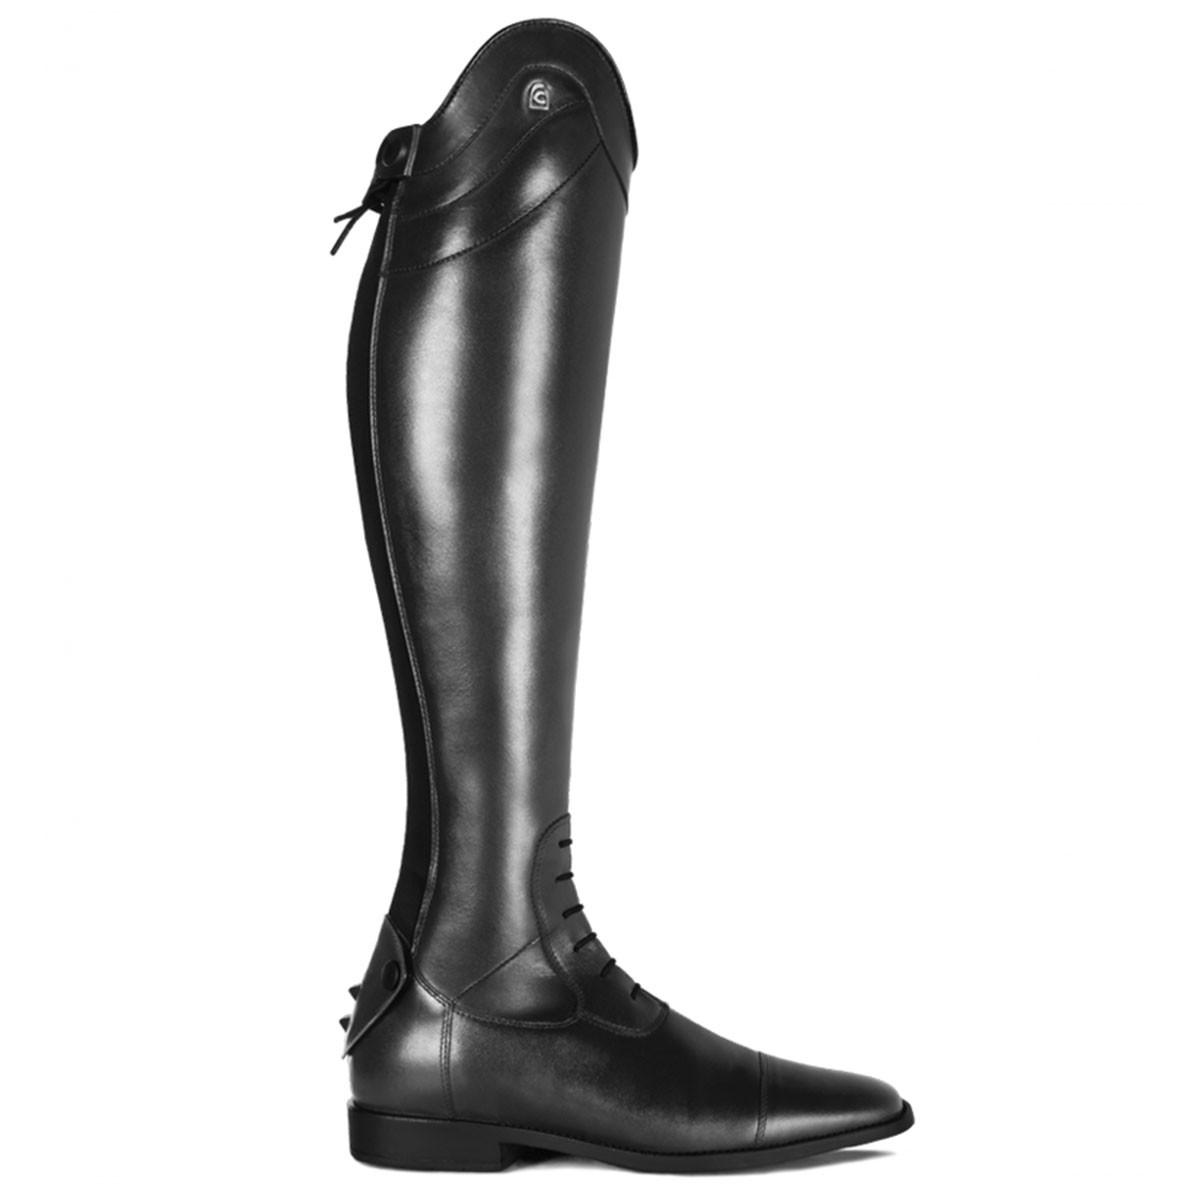 Cavallo Linus Slim rijlaars zwart maat:8-8.5 / h50-w37